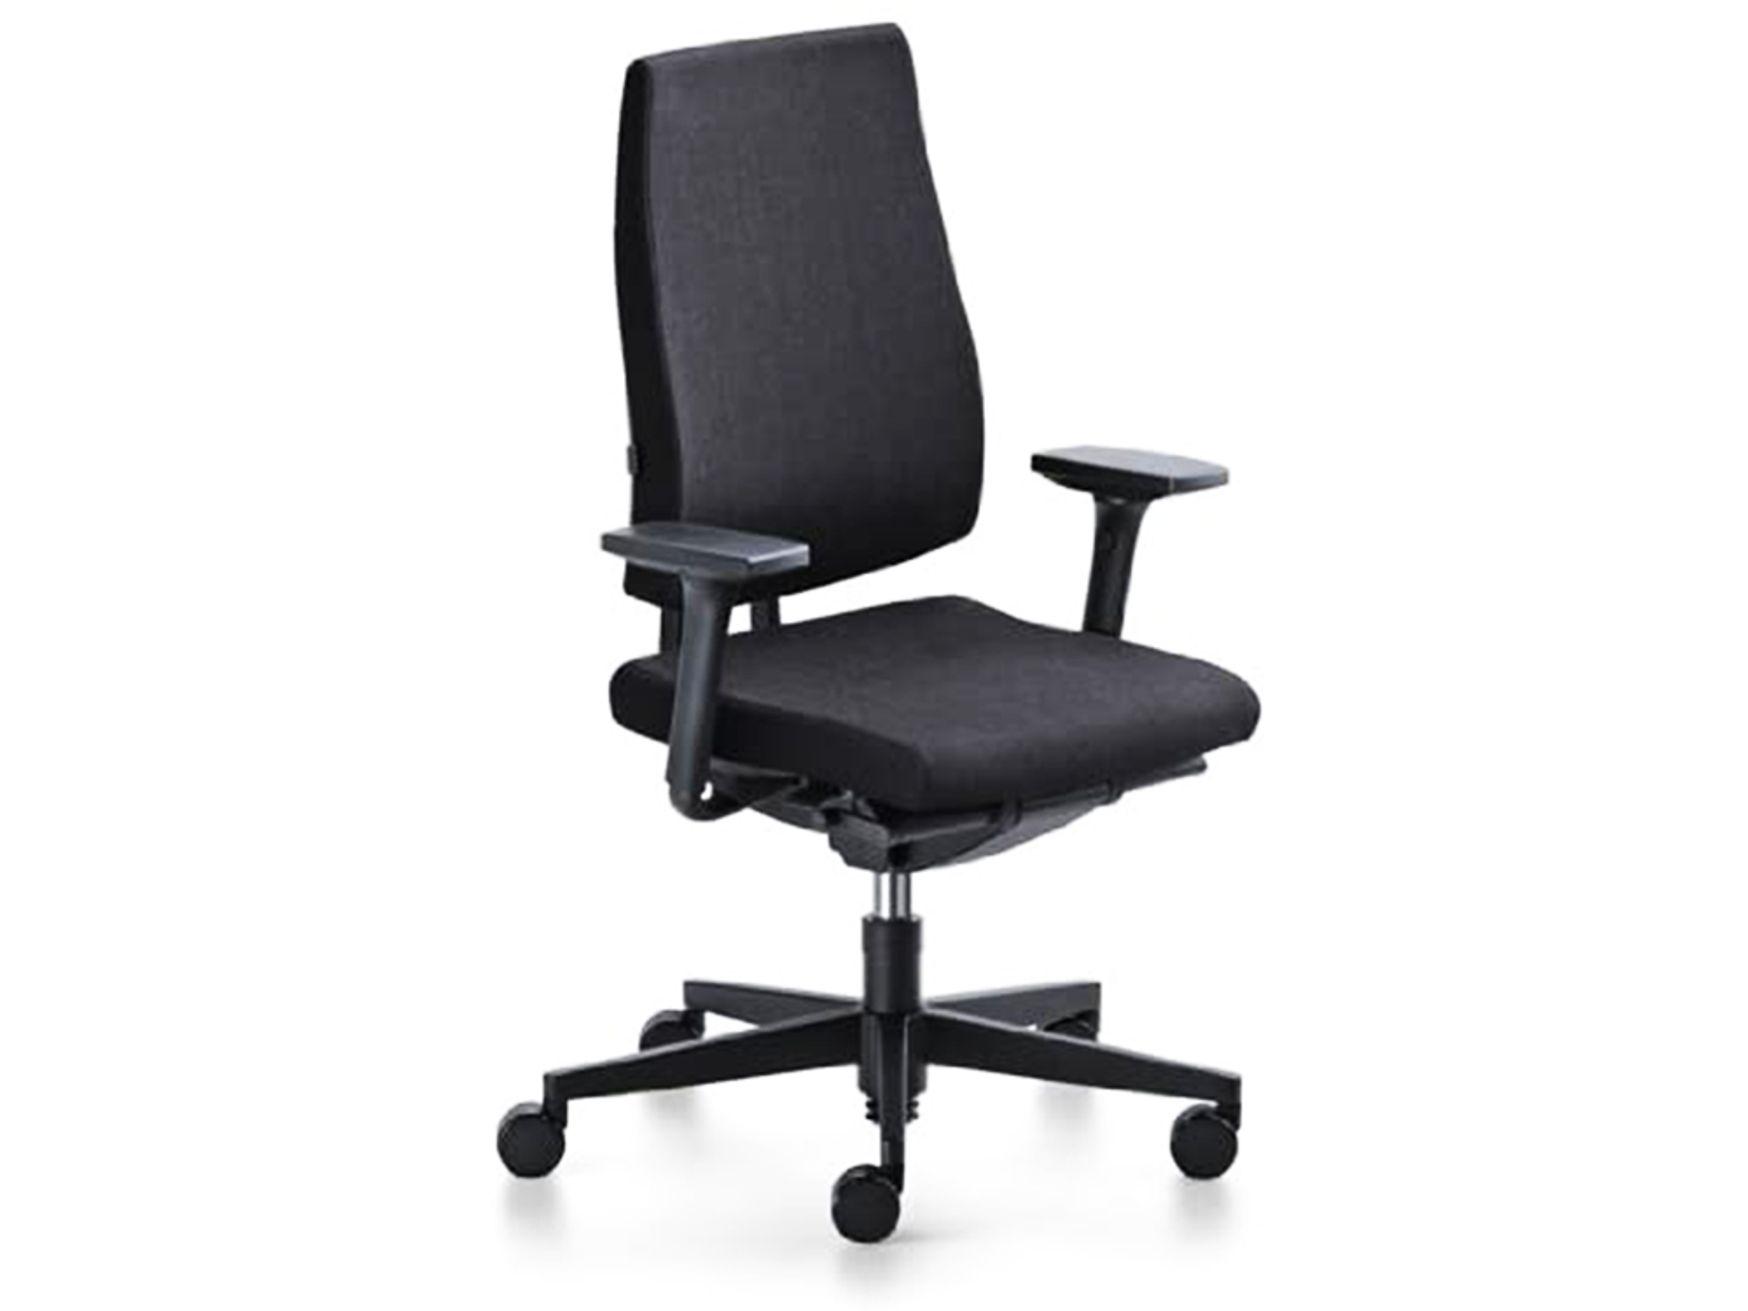 Refurbished Sedus Black Dot Operator Chairs in black